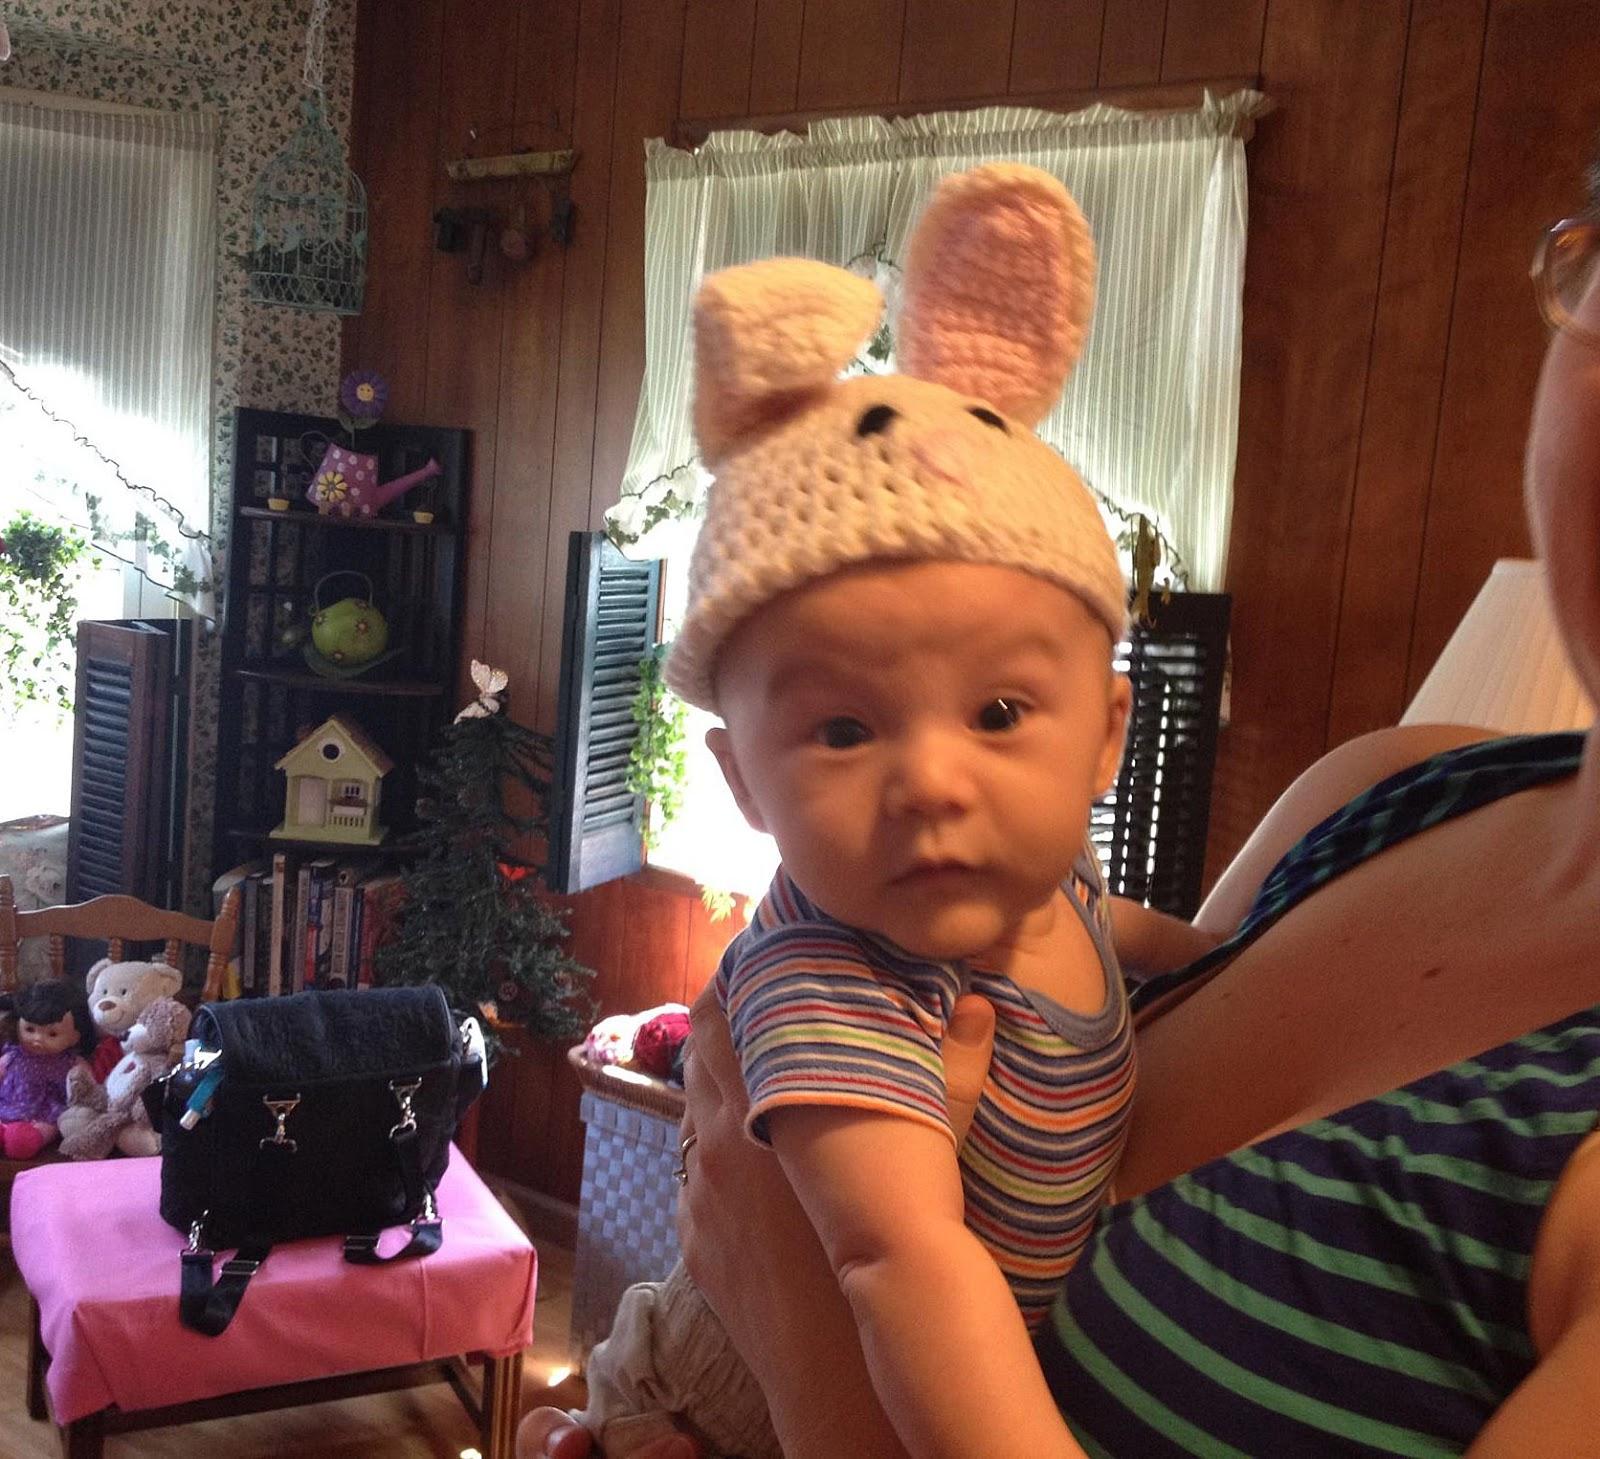 Crochet Baby Bunny Hat worn by Freddy!